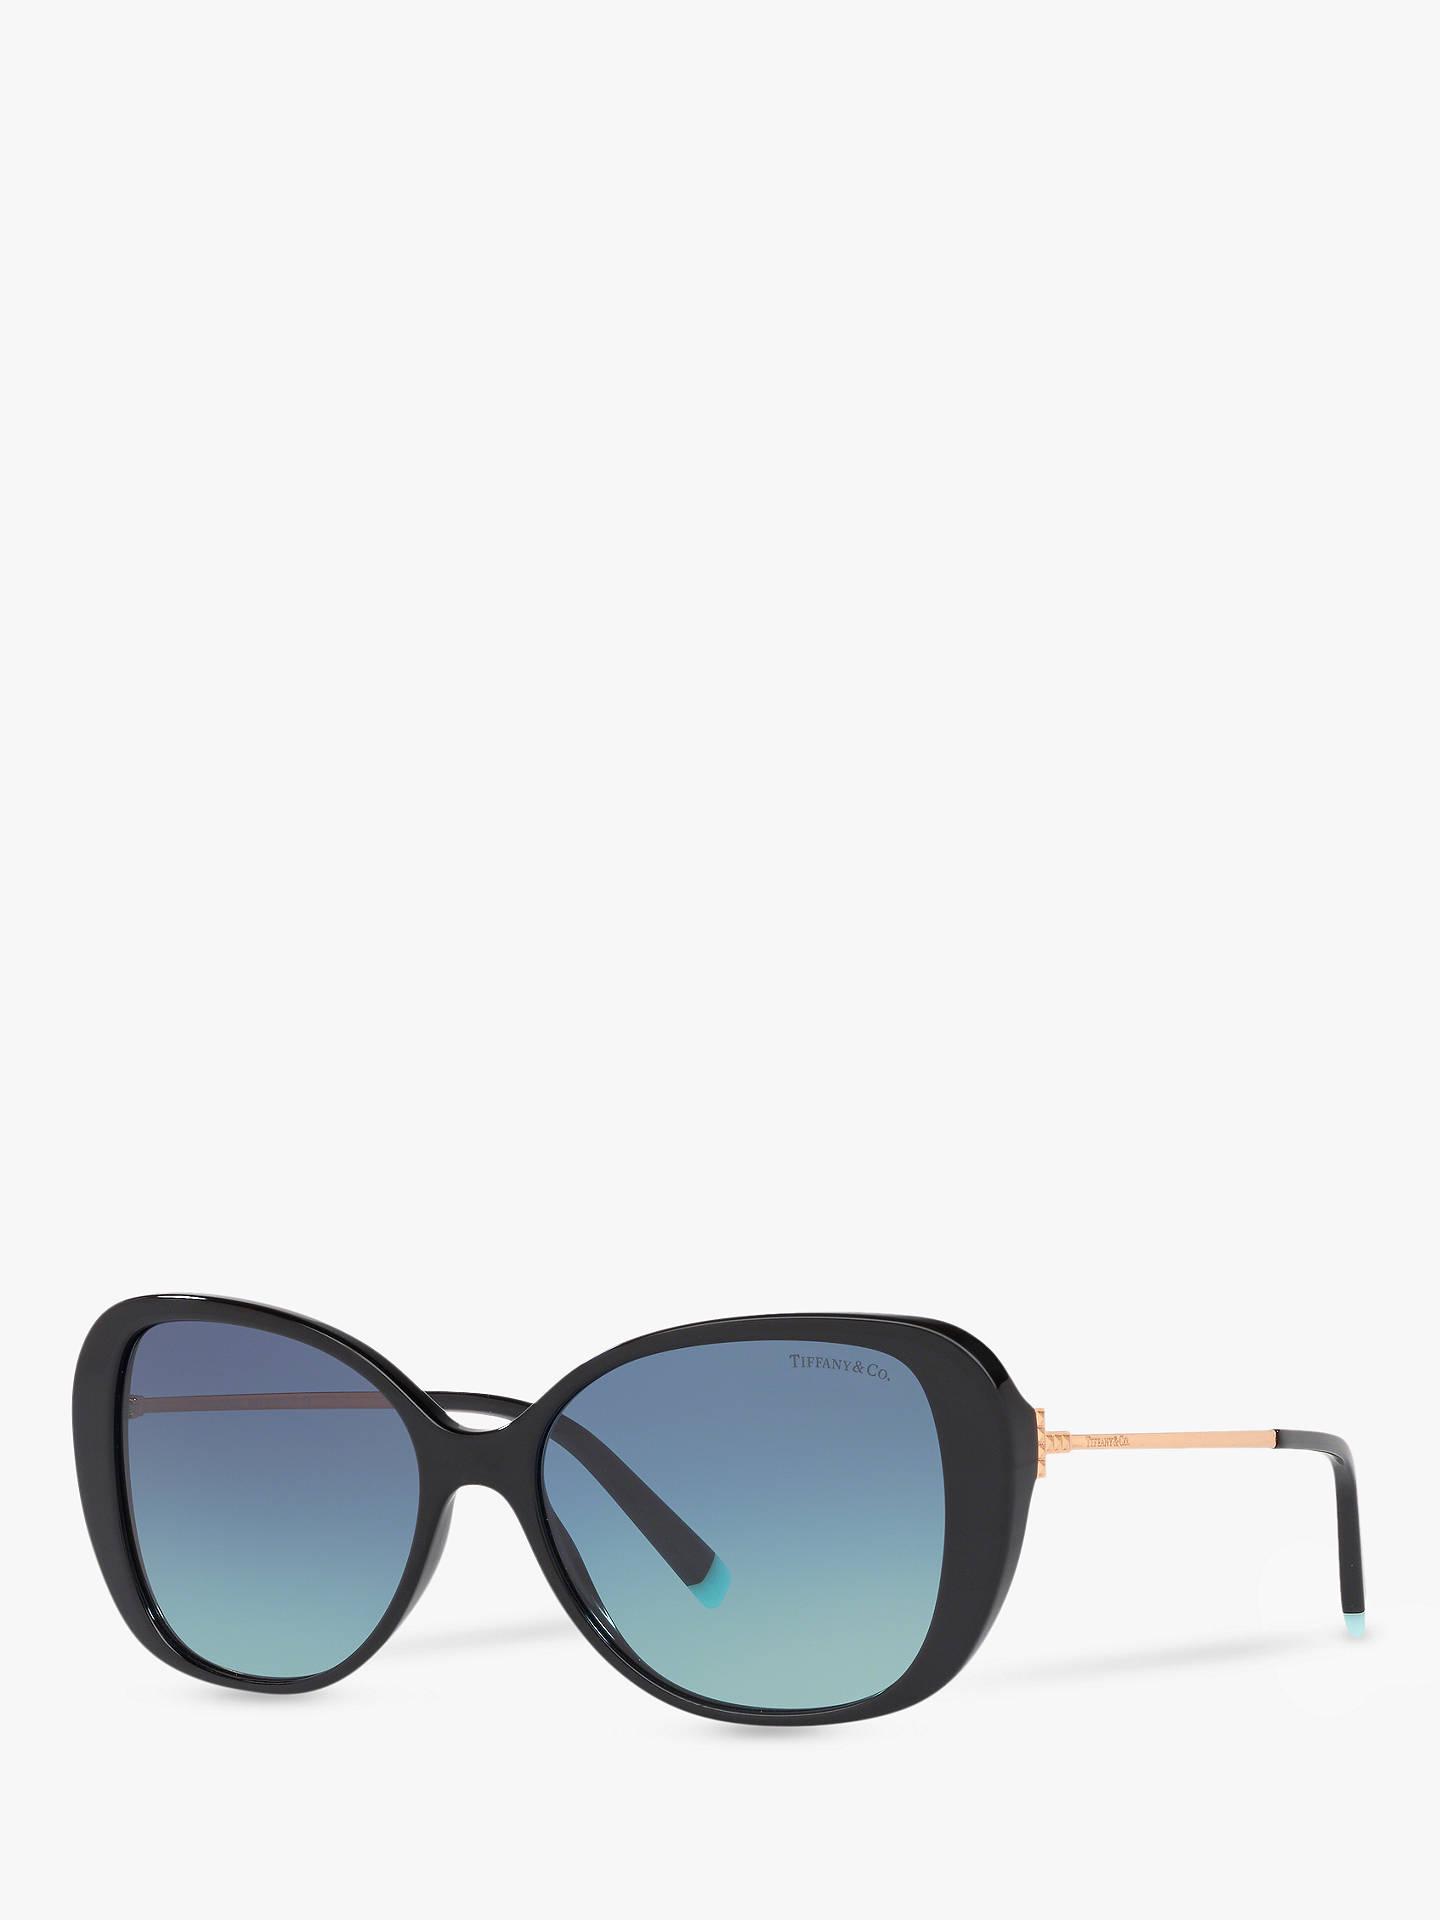 0ddaf6f2be2c Buy Tiffany   Co TF4156 Women s Cat s Eye Sunglasses